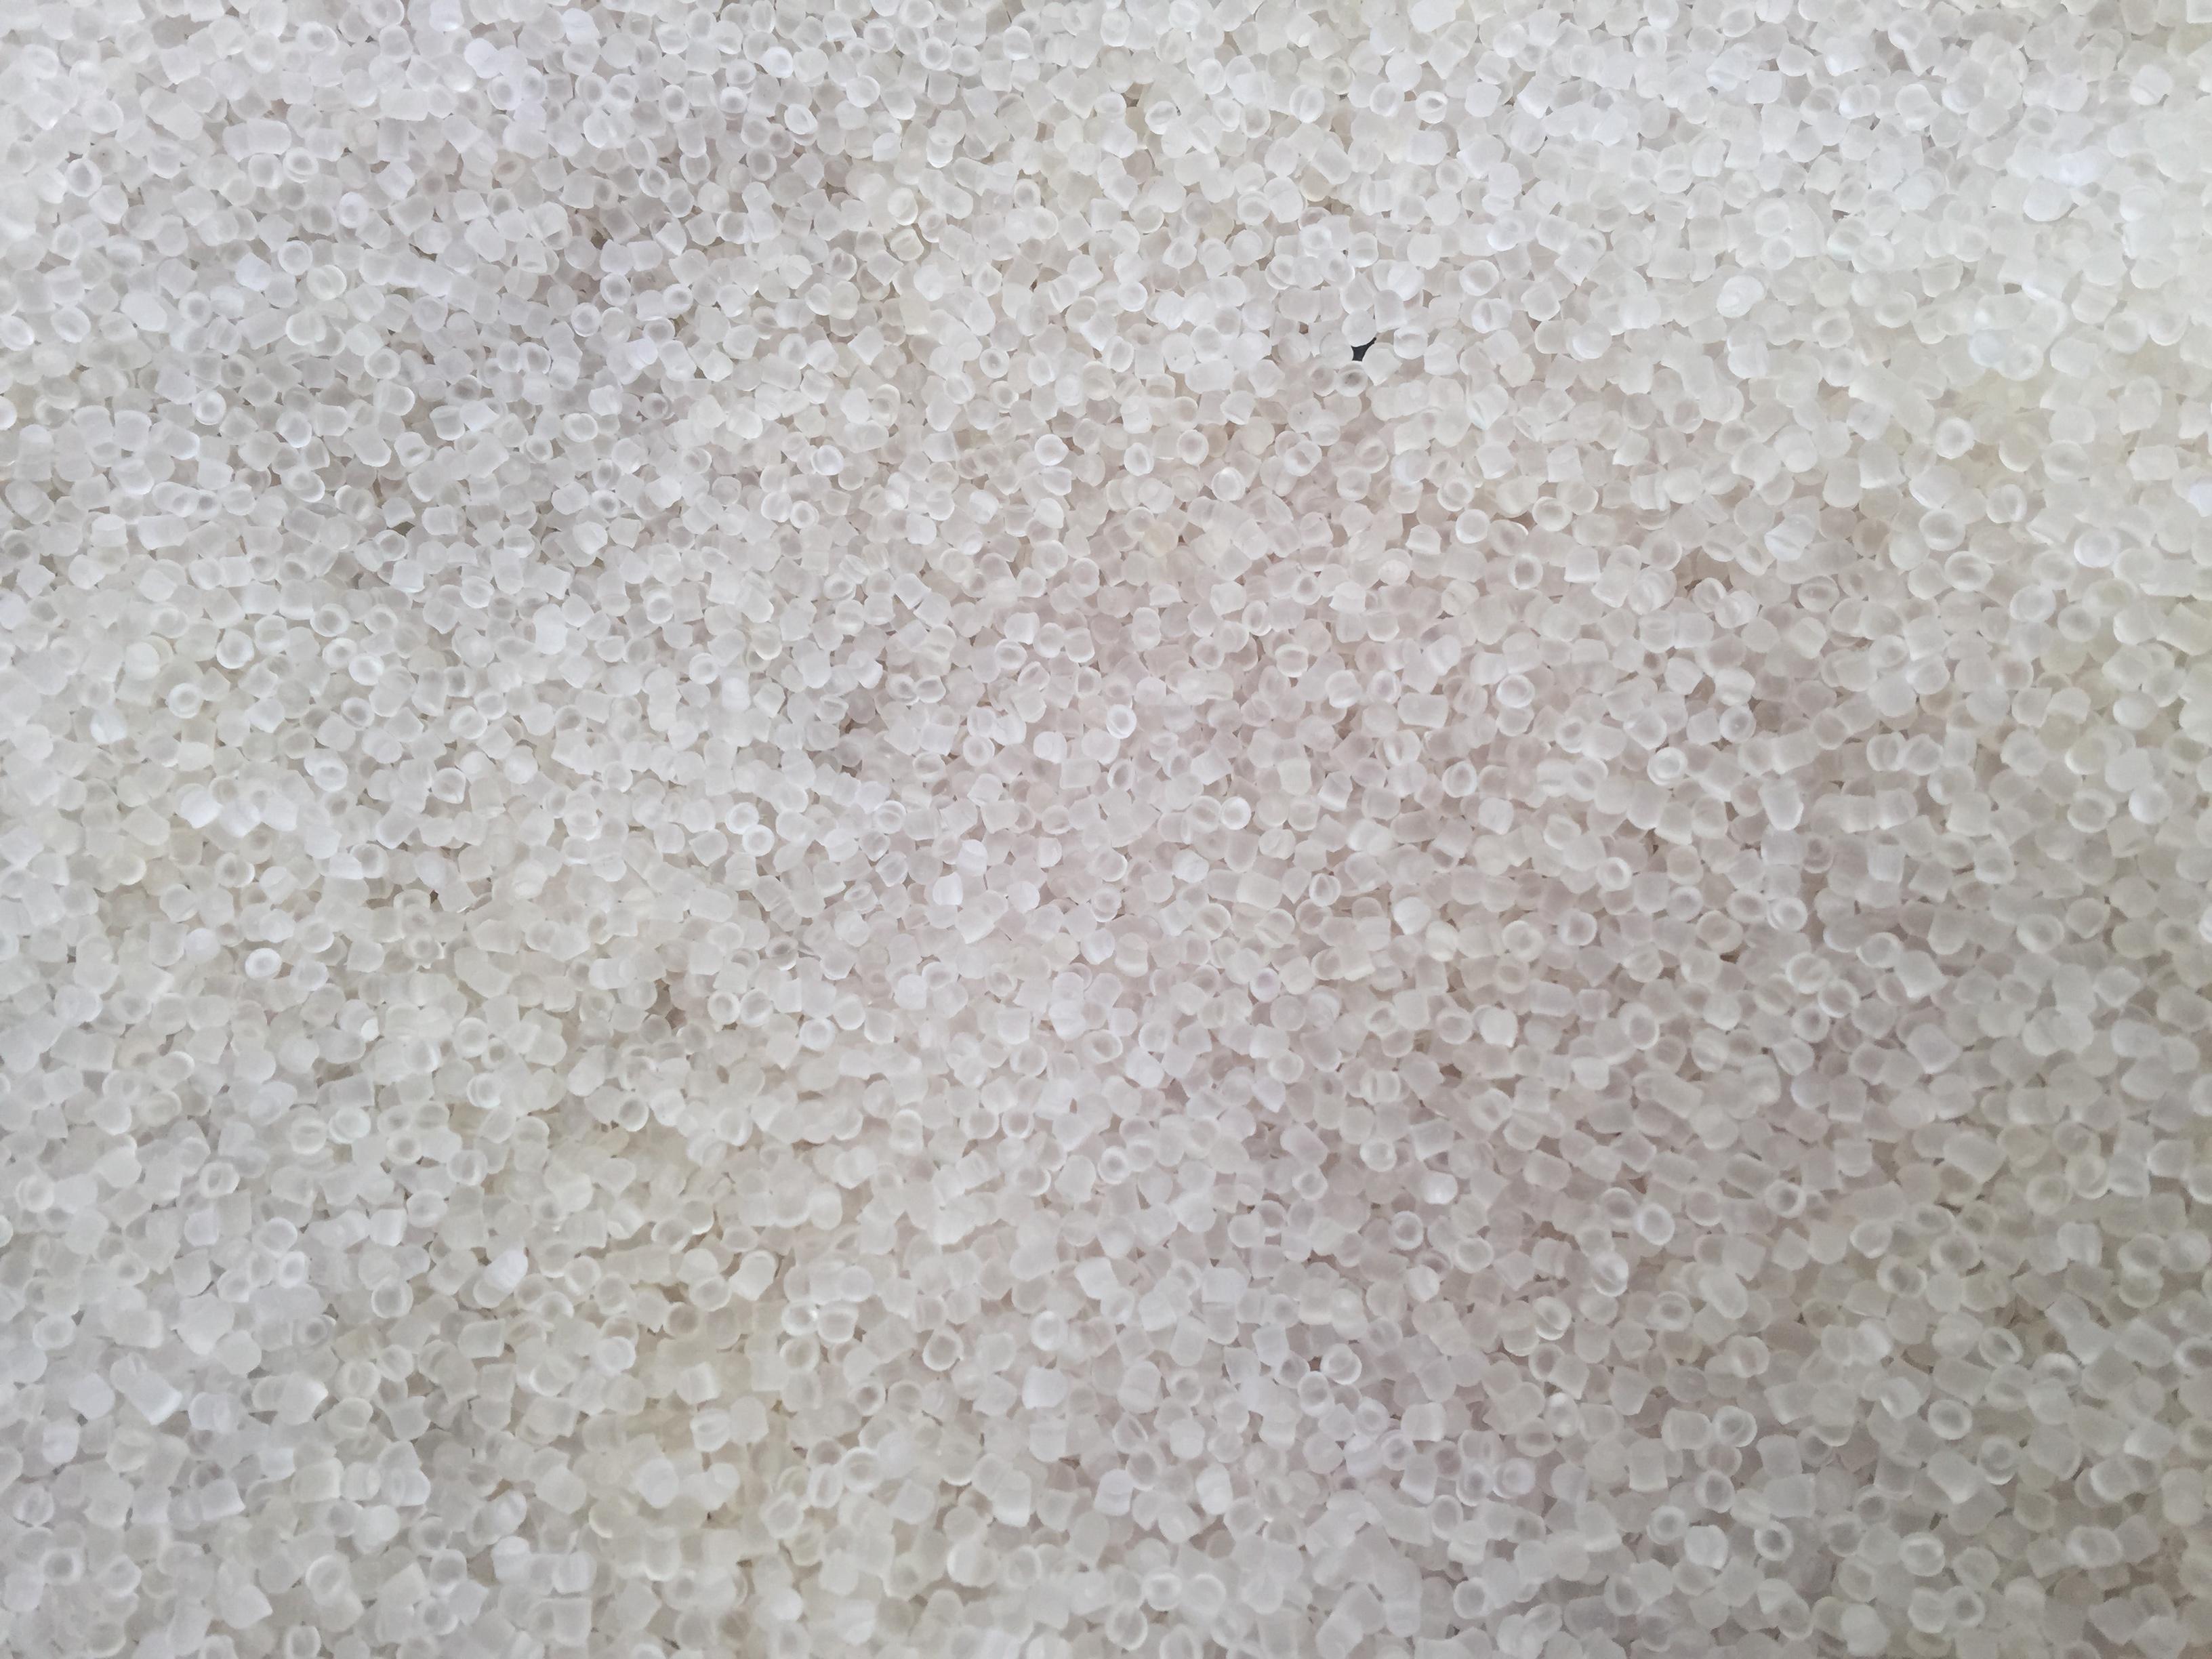 Ammon Kunststoffe - PVC-w (4)